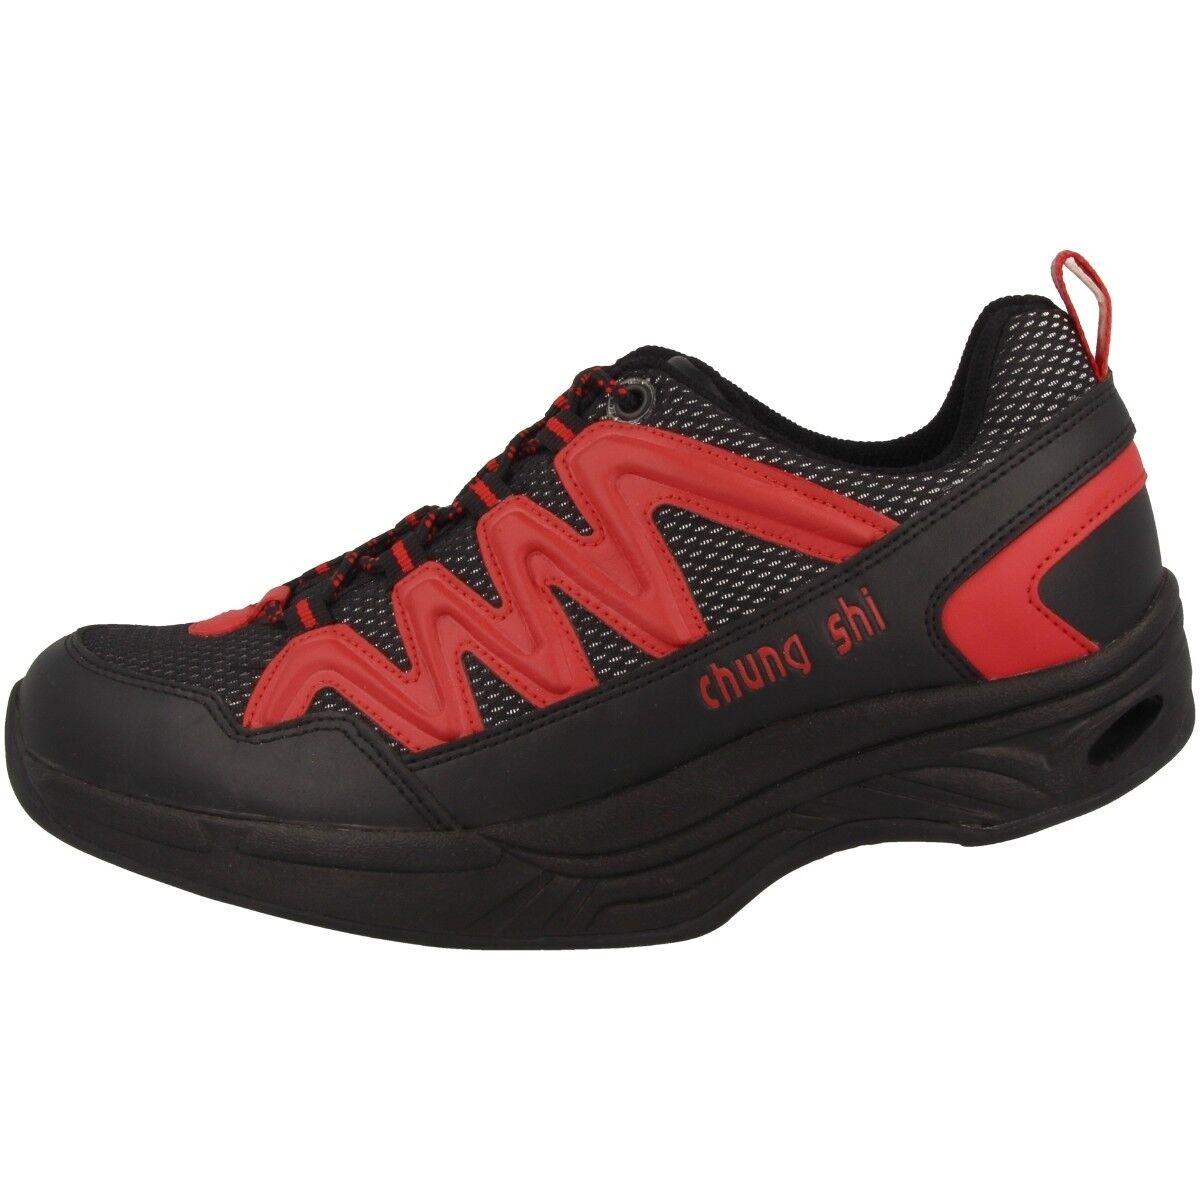 Chung Shi Comfort Step level 1 Magic zapatos caballero zapatillas  salud 9101015  tienda de venta